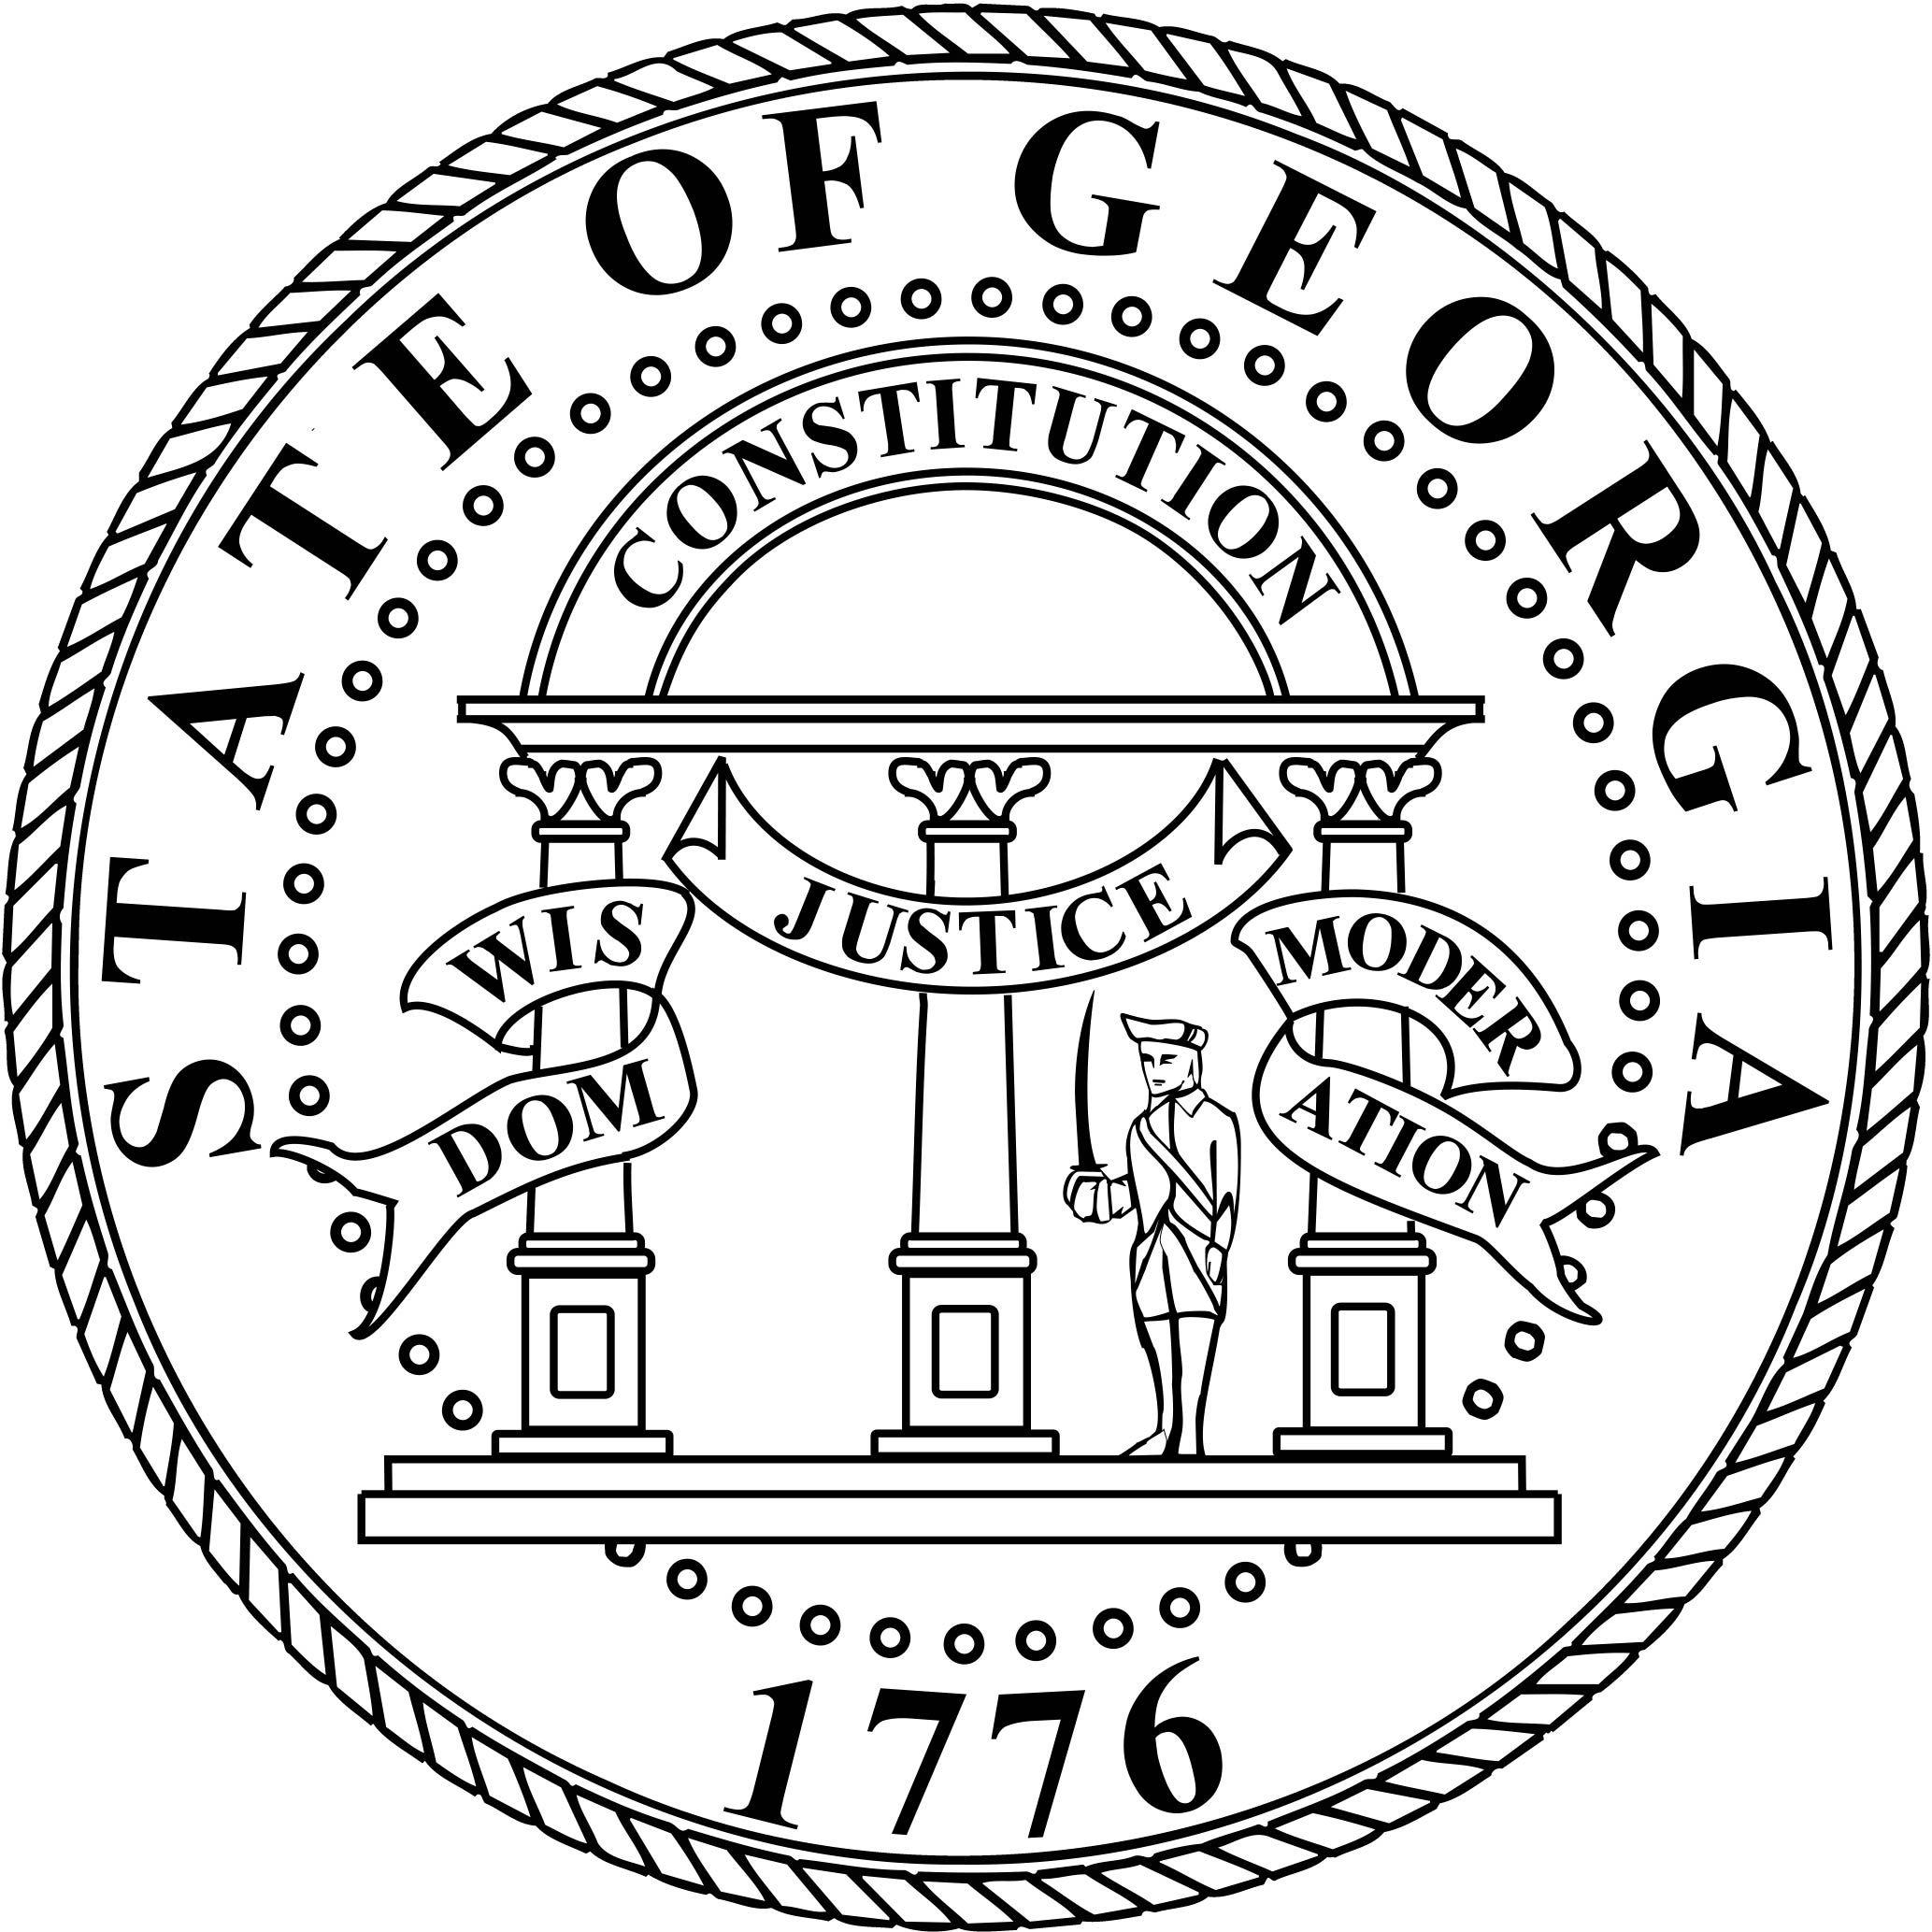 Georgia State Motto Wisdom Justice Moderation